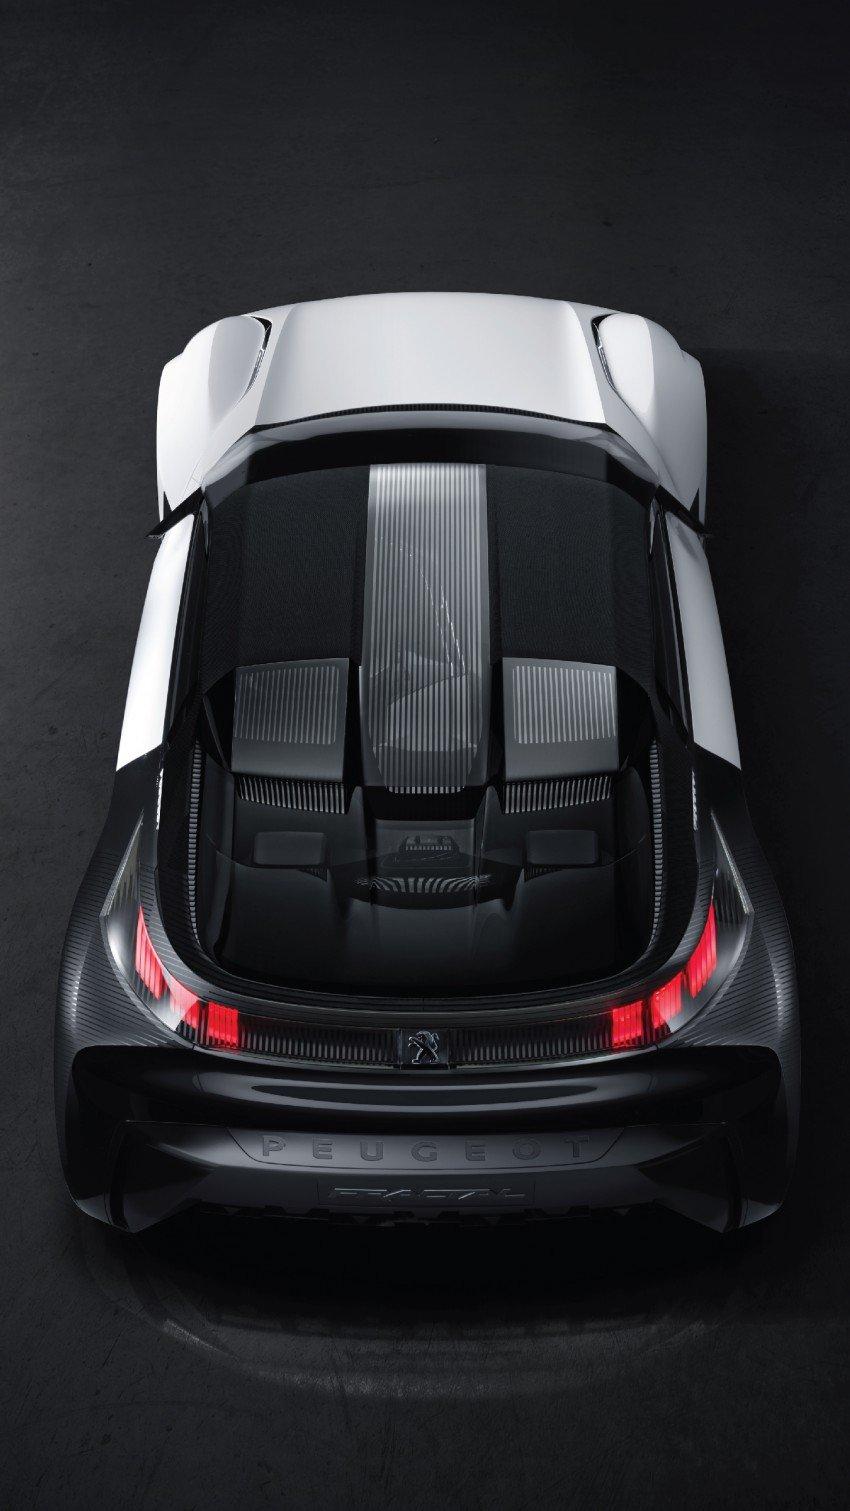 Peugeot Fractal – electric roadster concept unveiled Image #373724